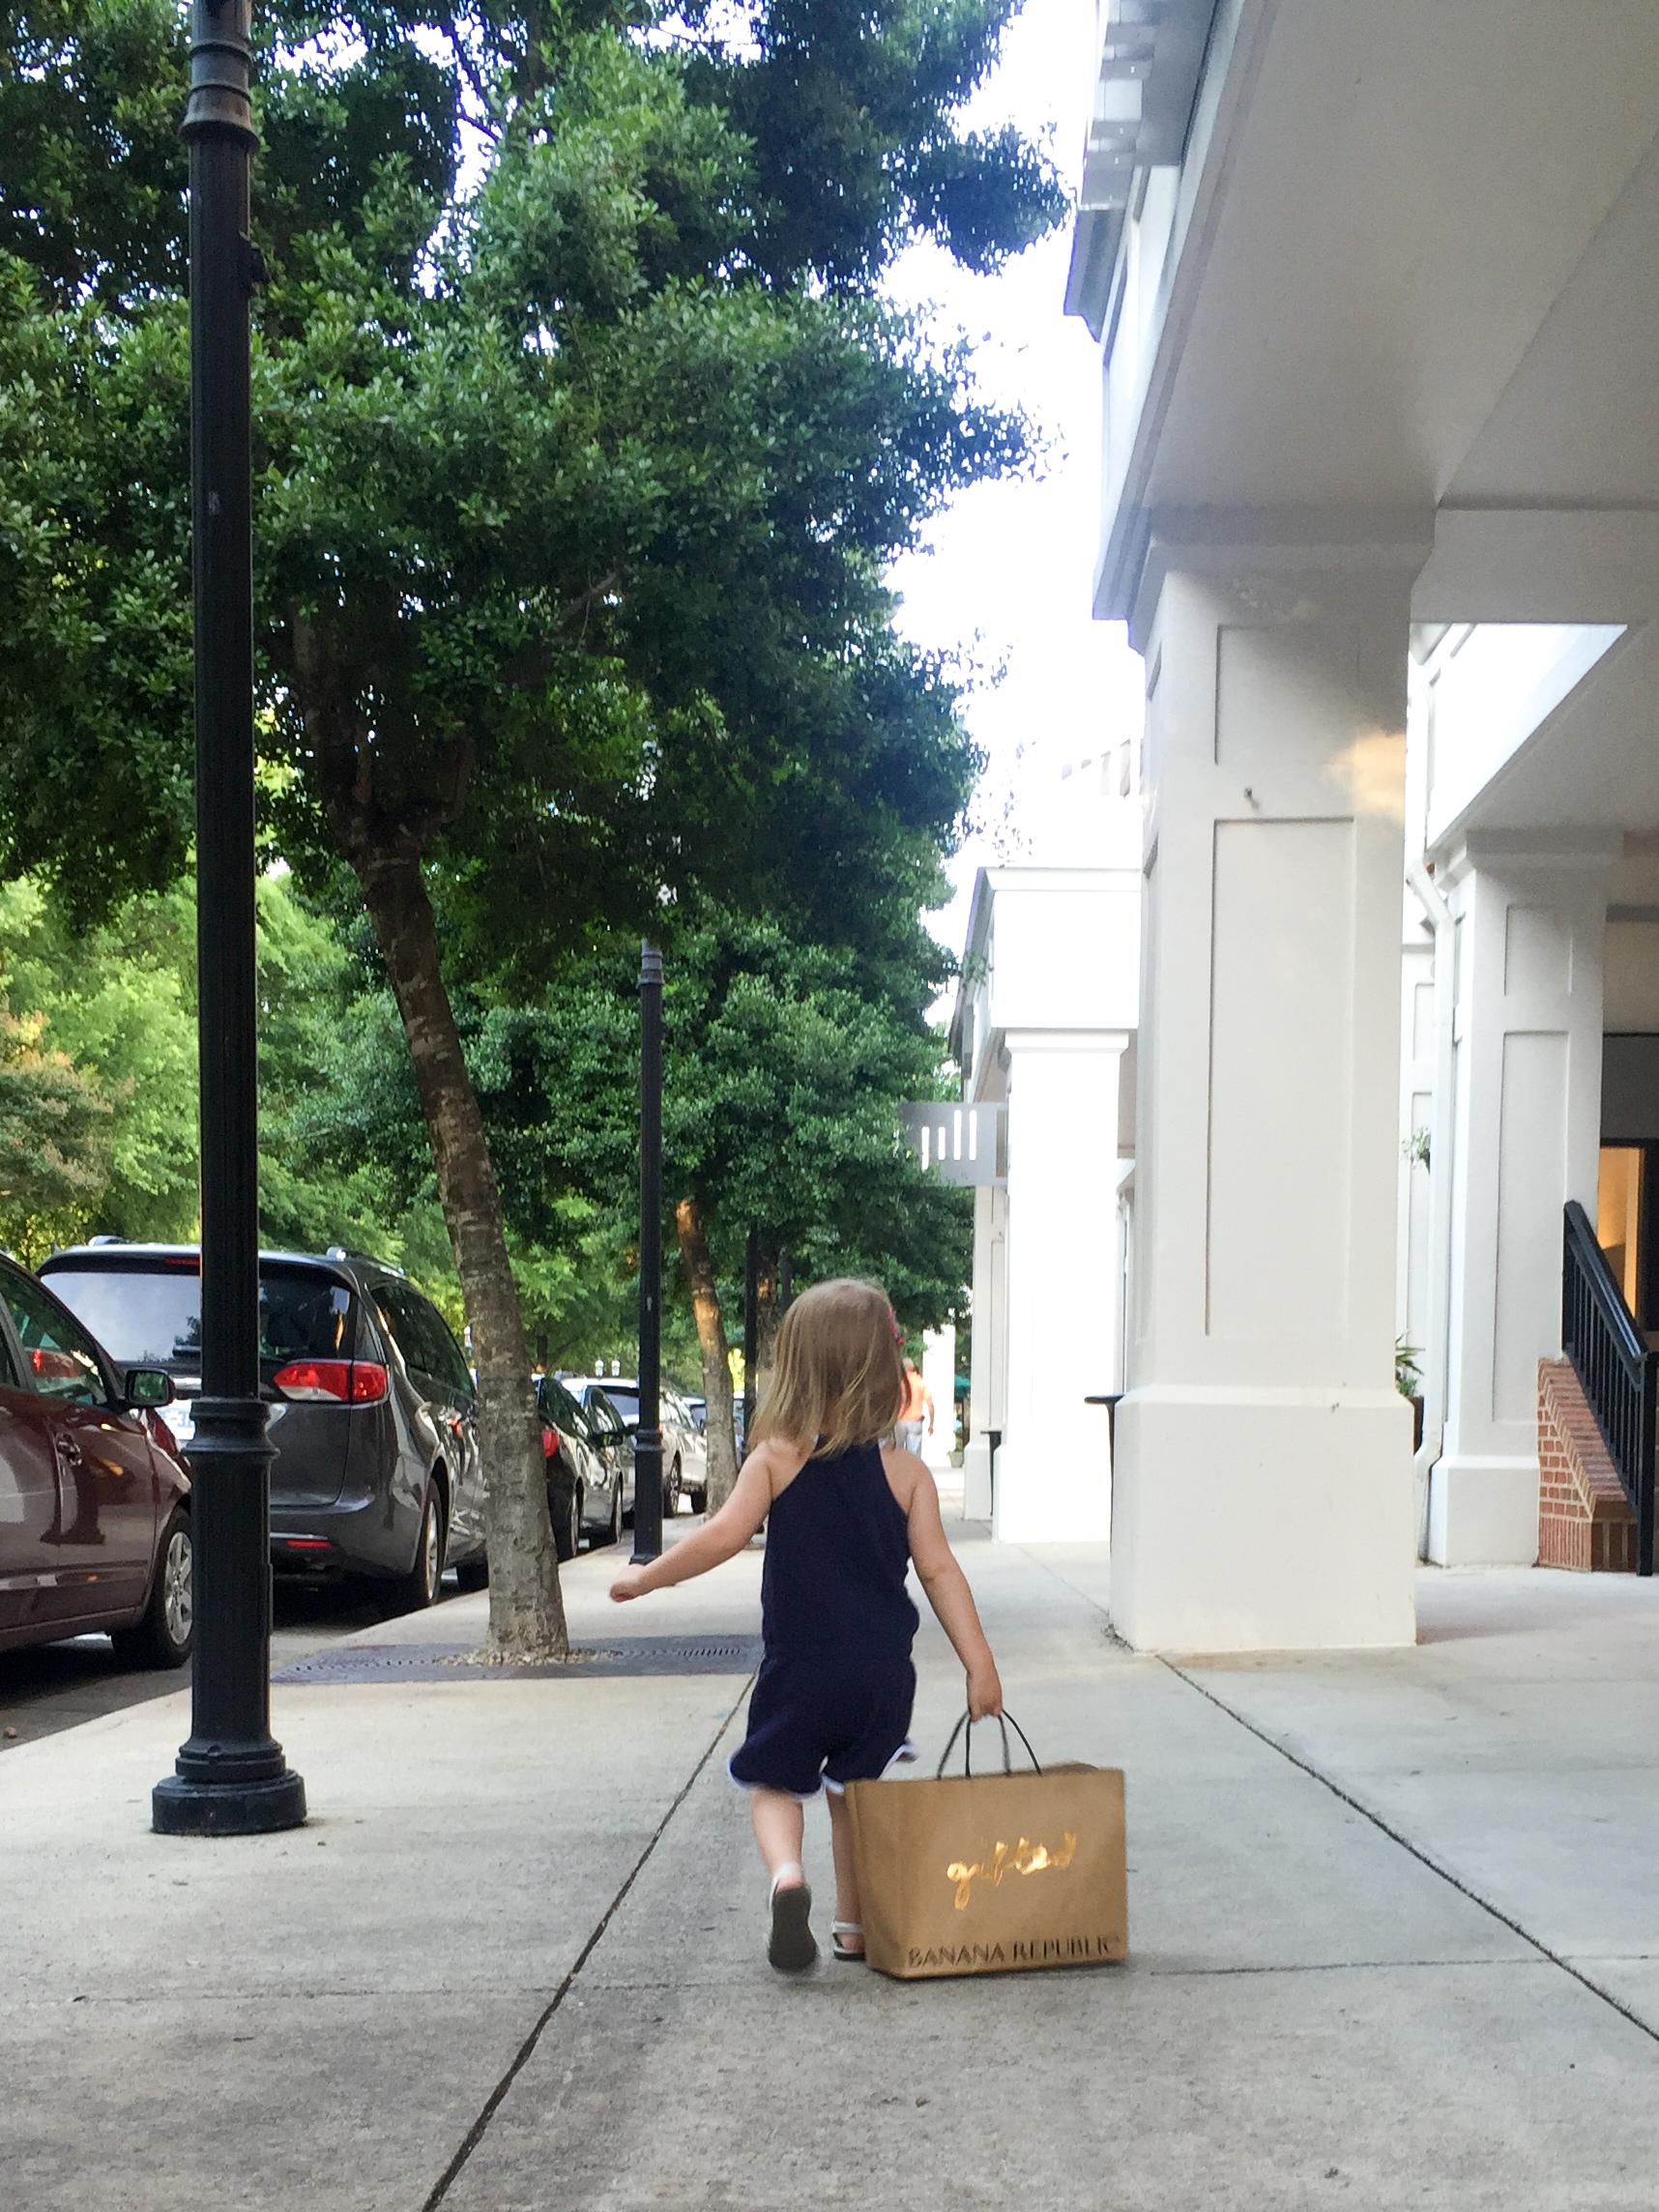 birkdale-village-huntersville-nc-toddler-shopping